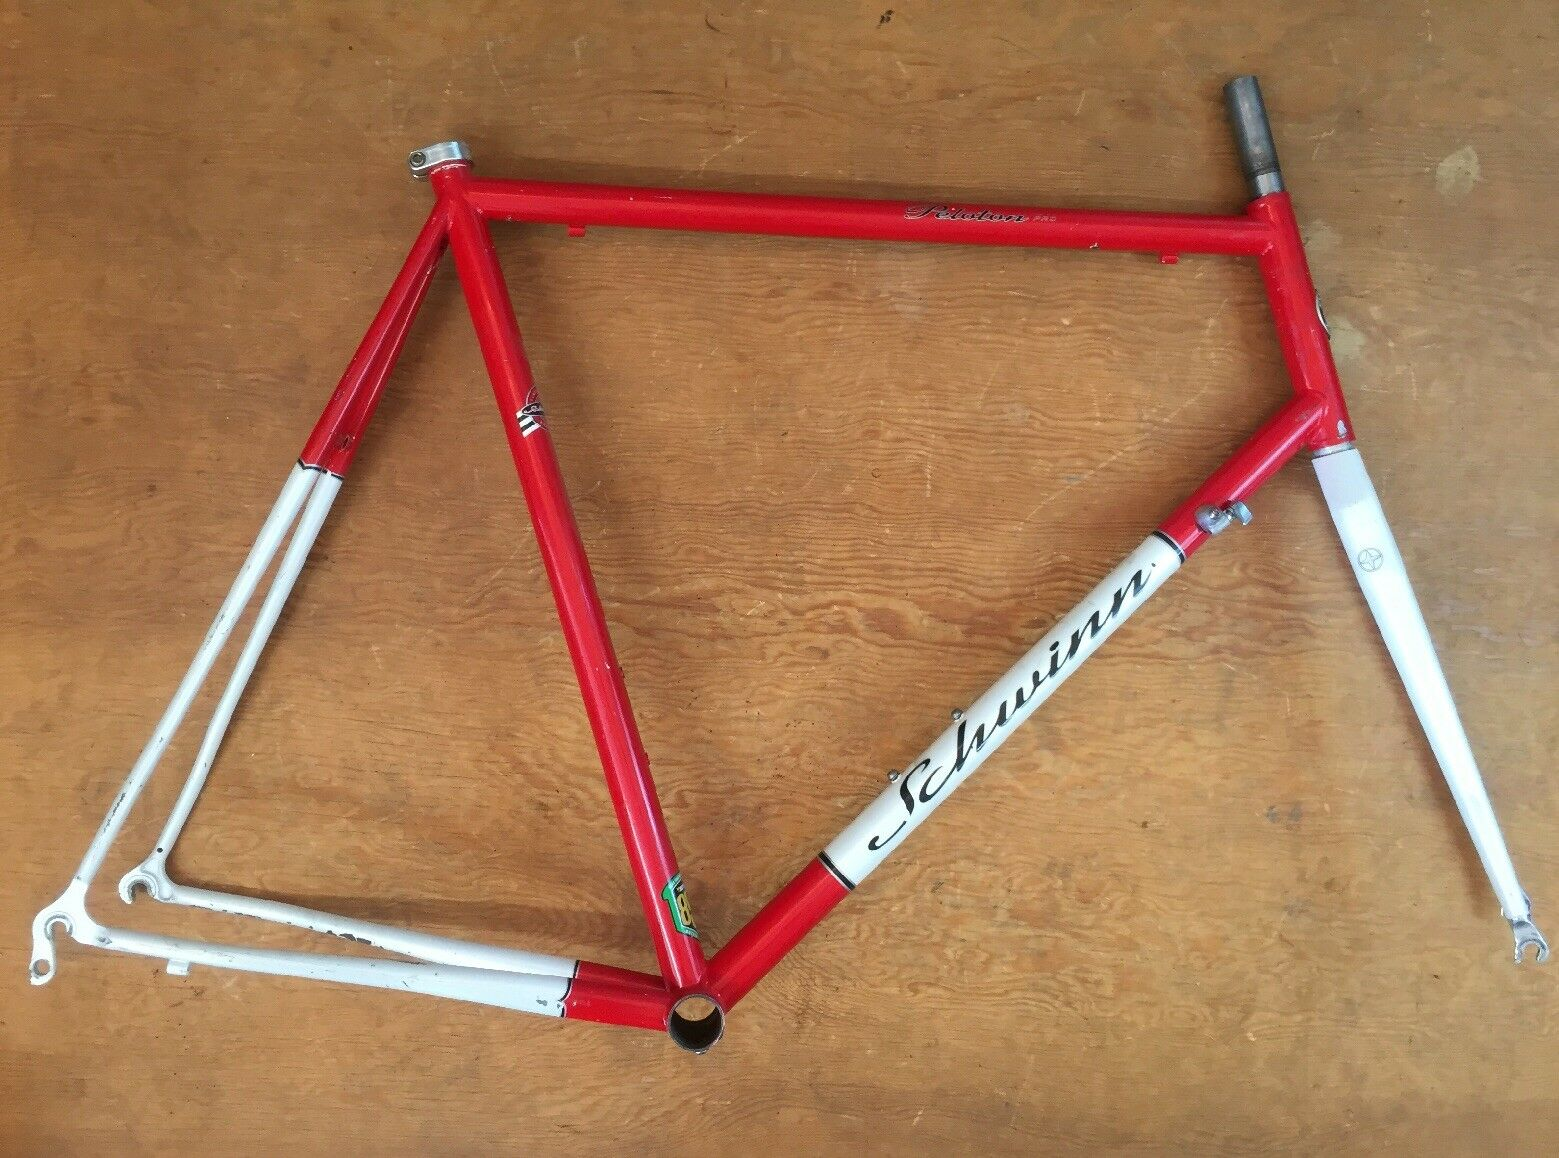 Schwinn Peloton Pro Reynolds 853 60cm Cadre & Fourche Vélo Route Frameset rouge